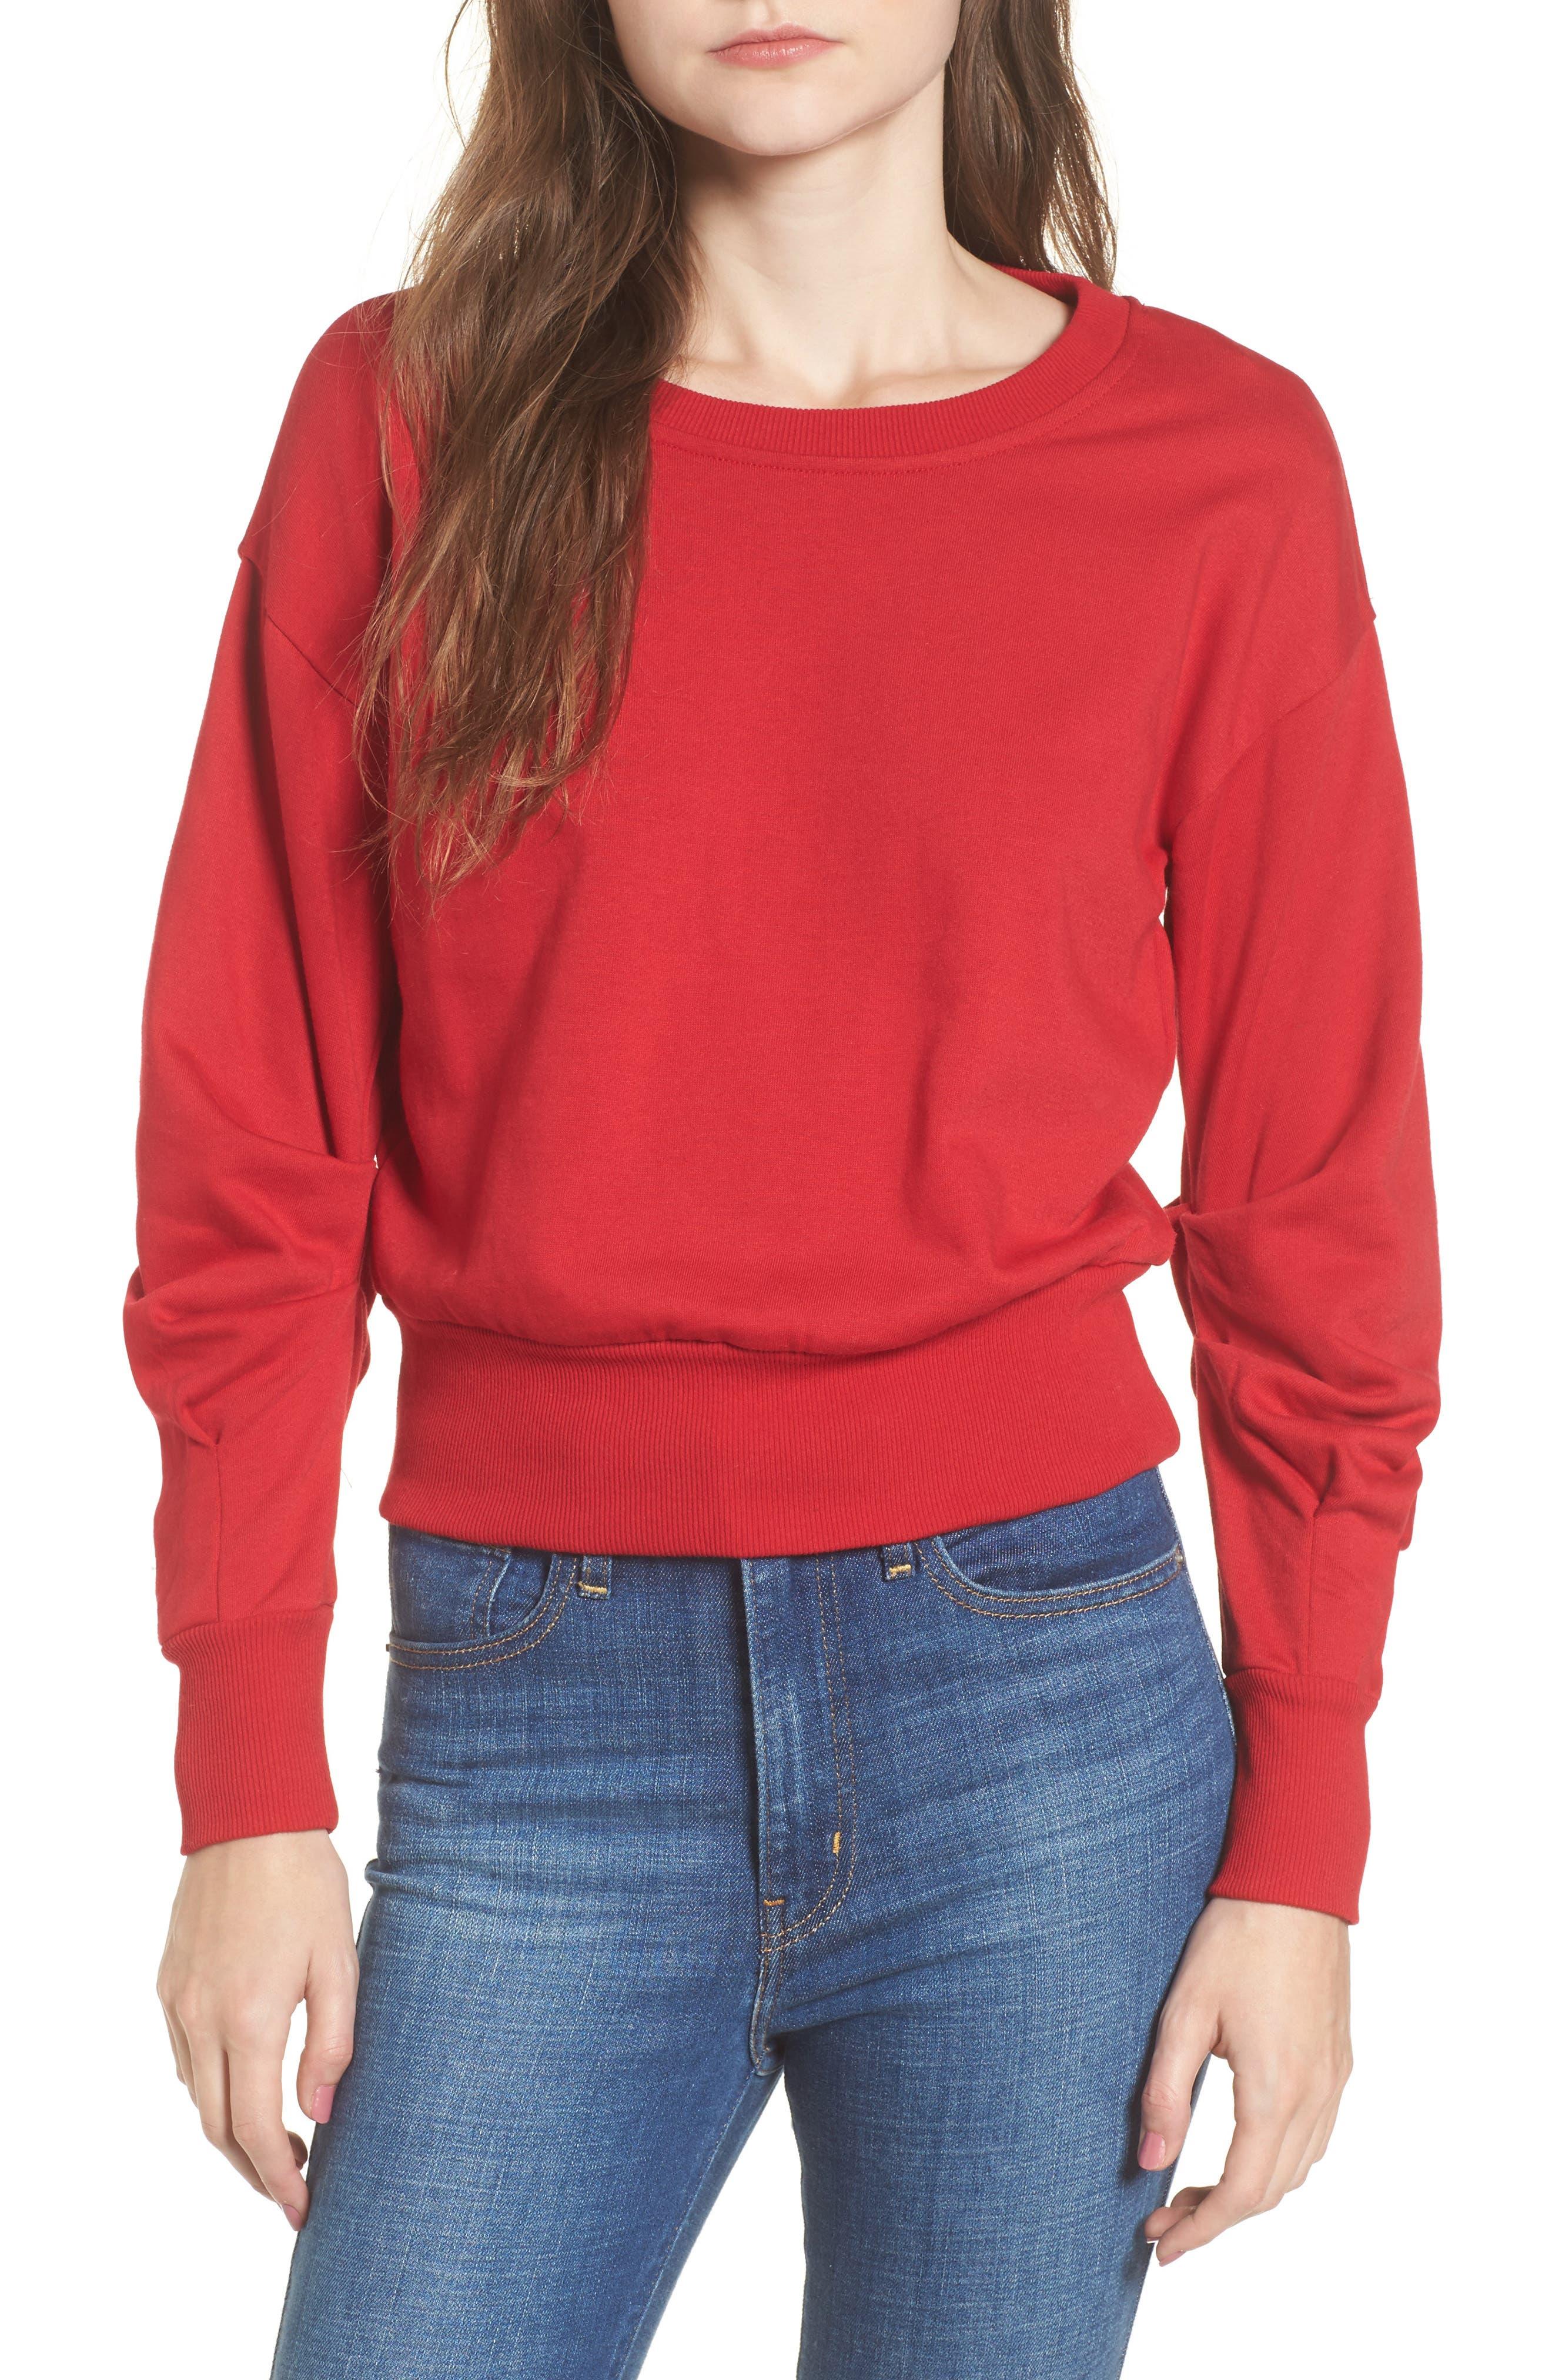 Socialite Ruched Sleeve Sweatshirt